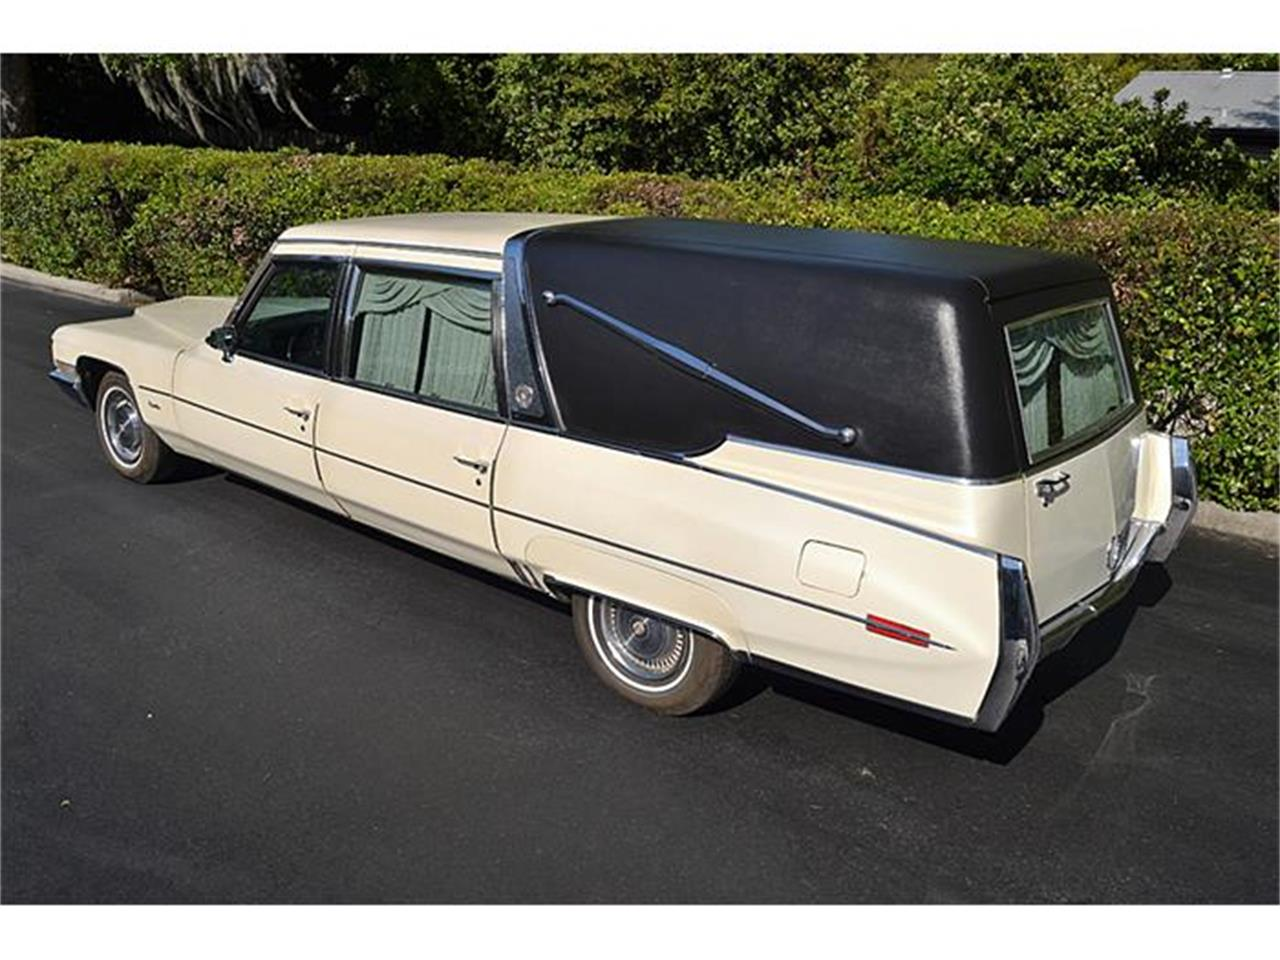 1971 Cadillac Crown Superior Hearse in Mount Dora (Orlando), Florida